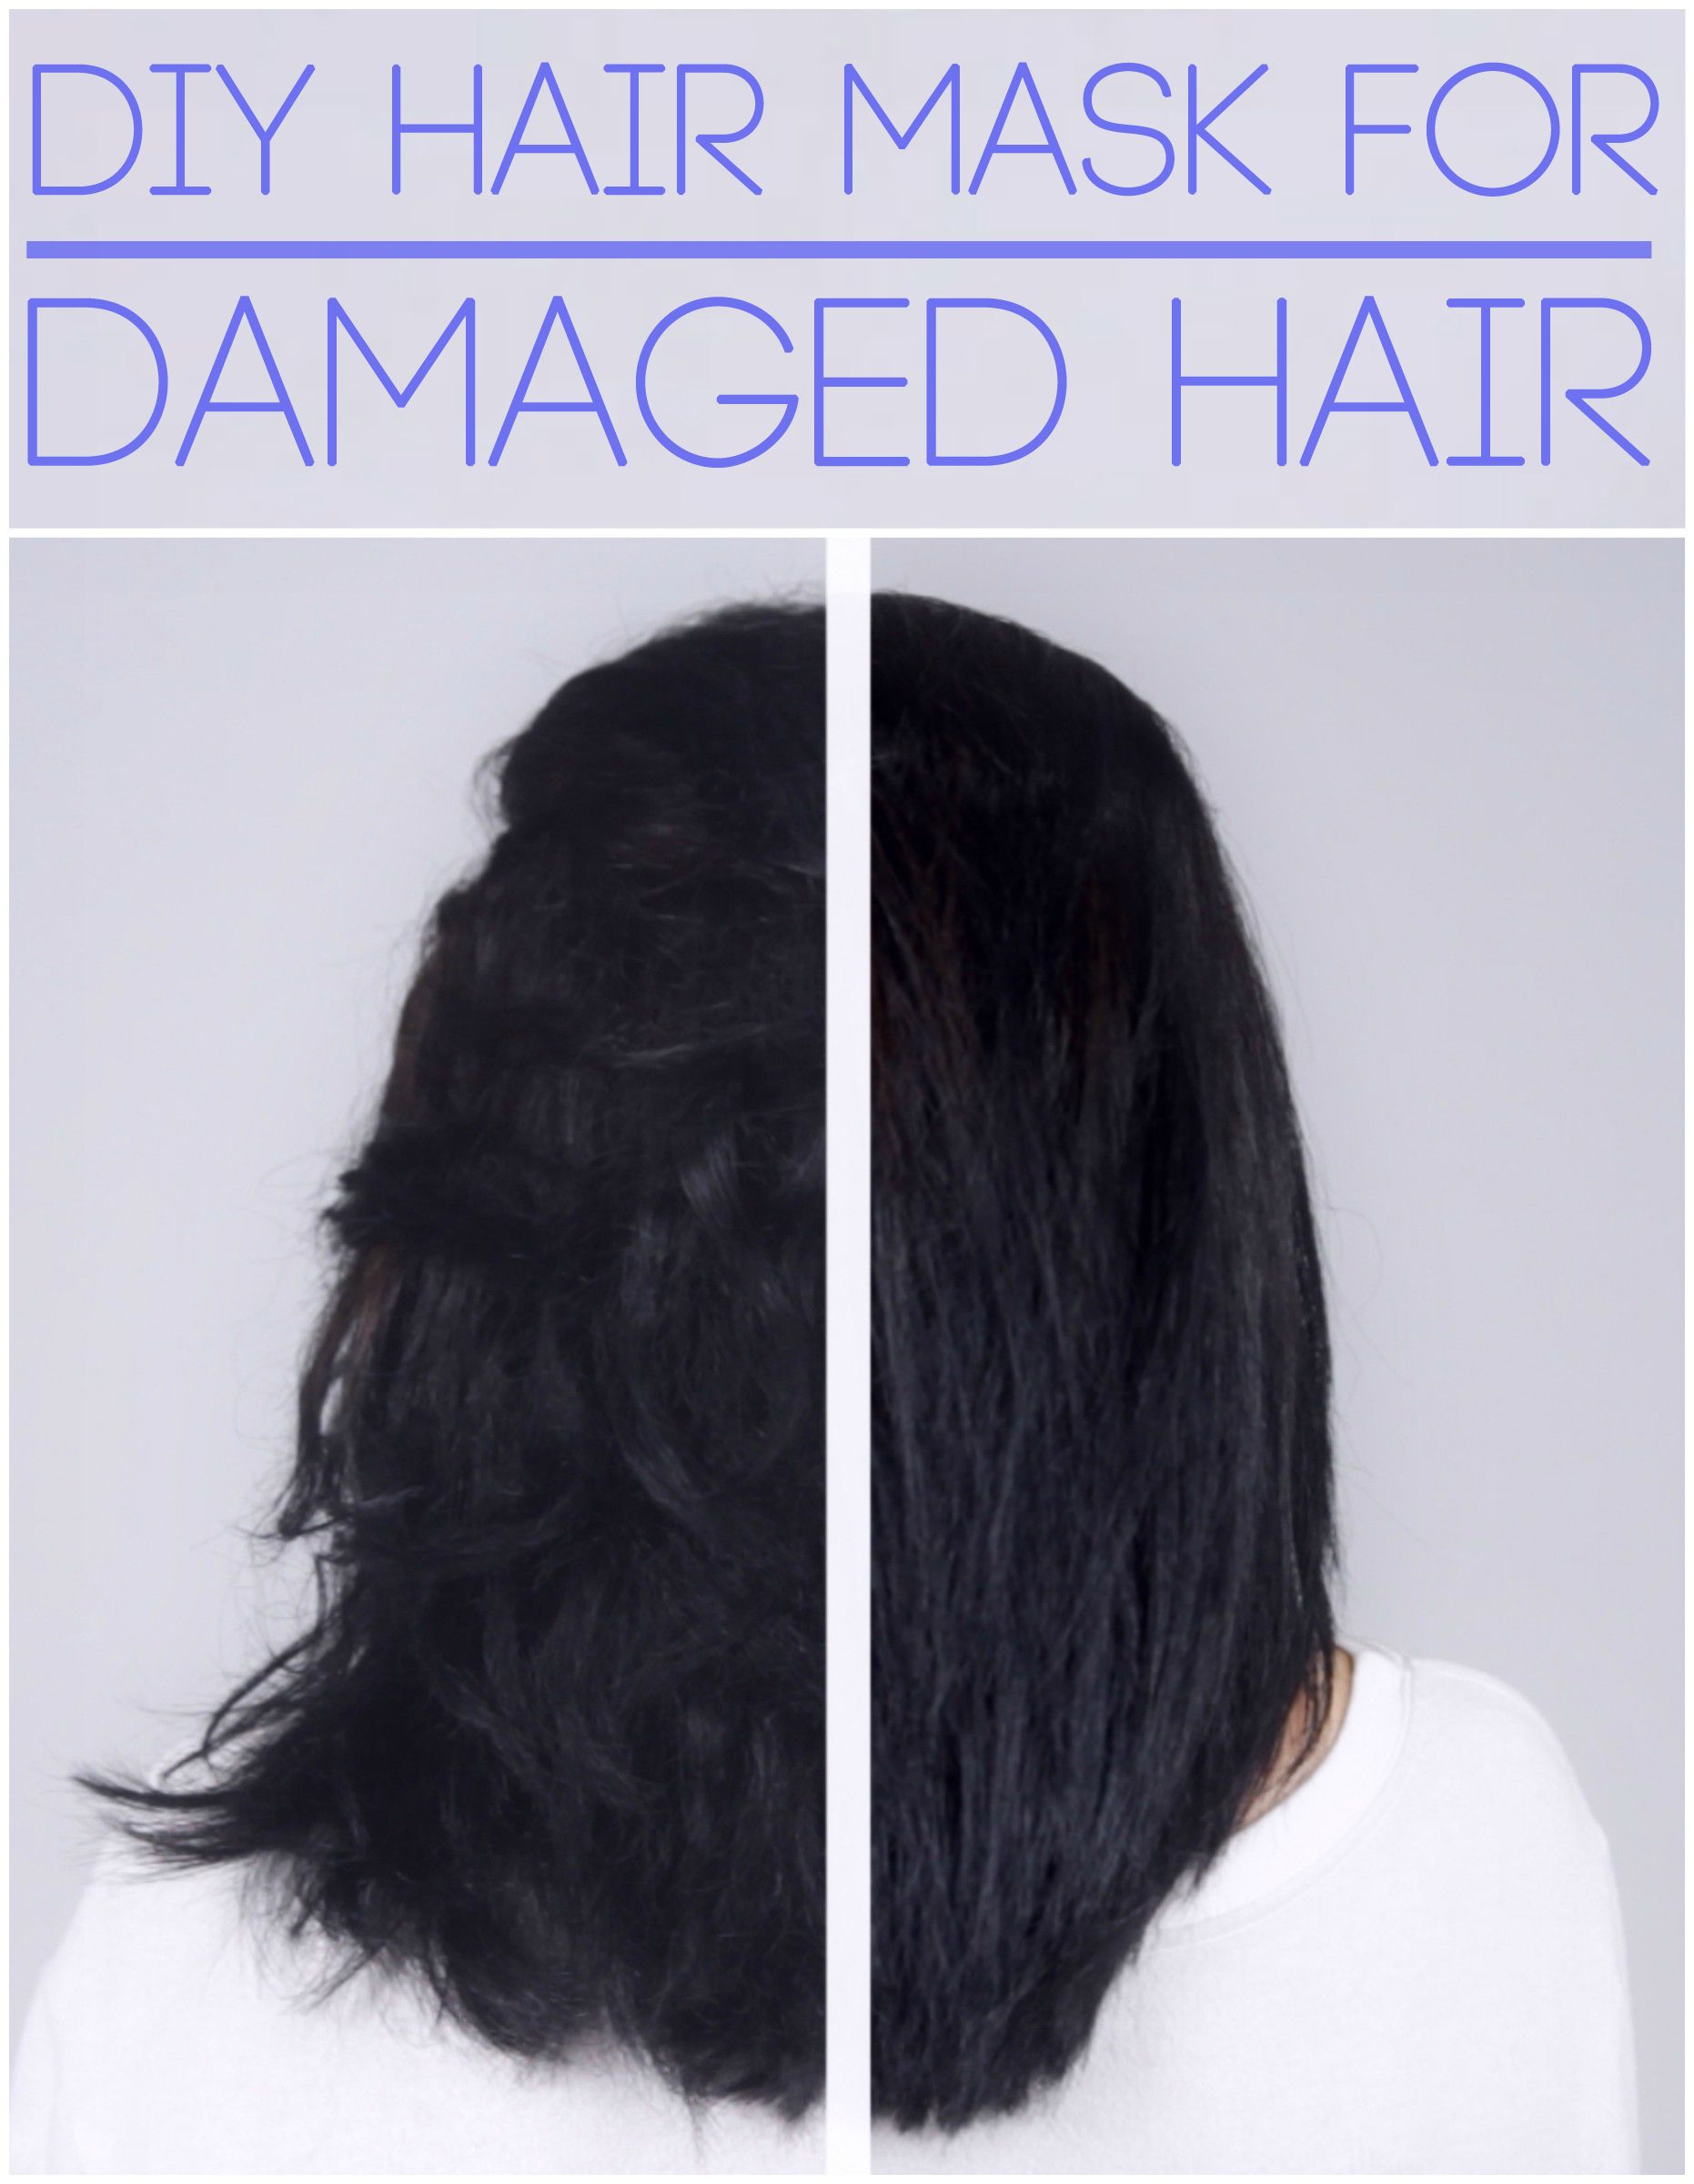 diy hair mask for dry damaged hair 1 egg yolk 2 tbsp coconut oil 1 tbsp honey hair. Black Bedroom Furniture Sets. Home Design Ideas